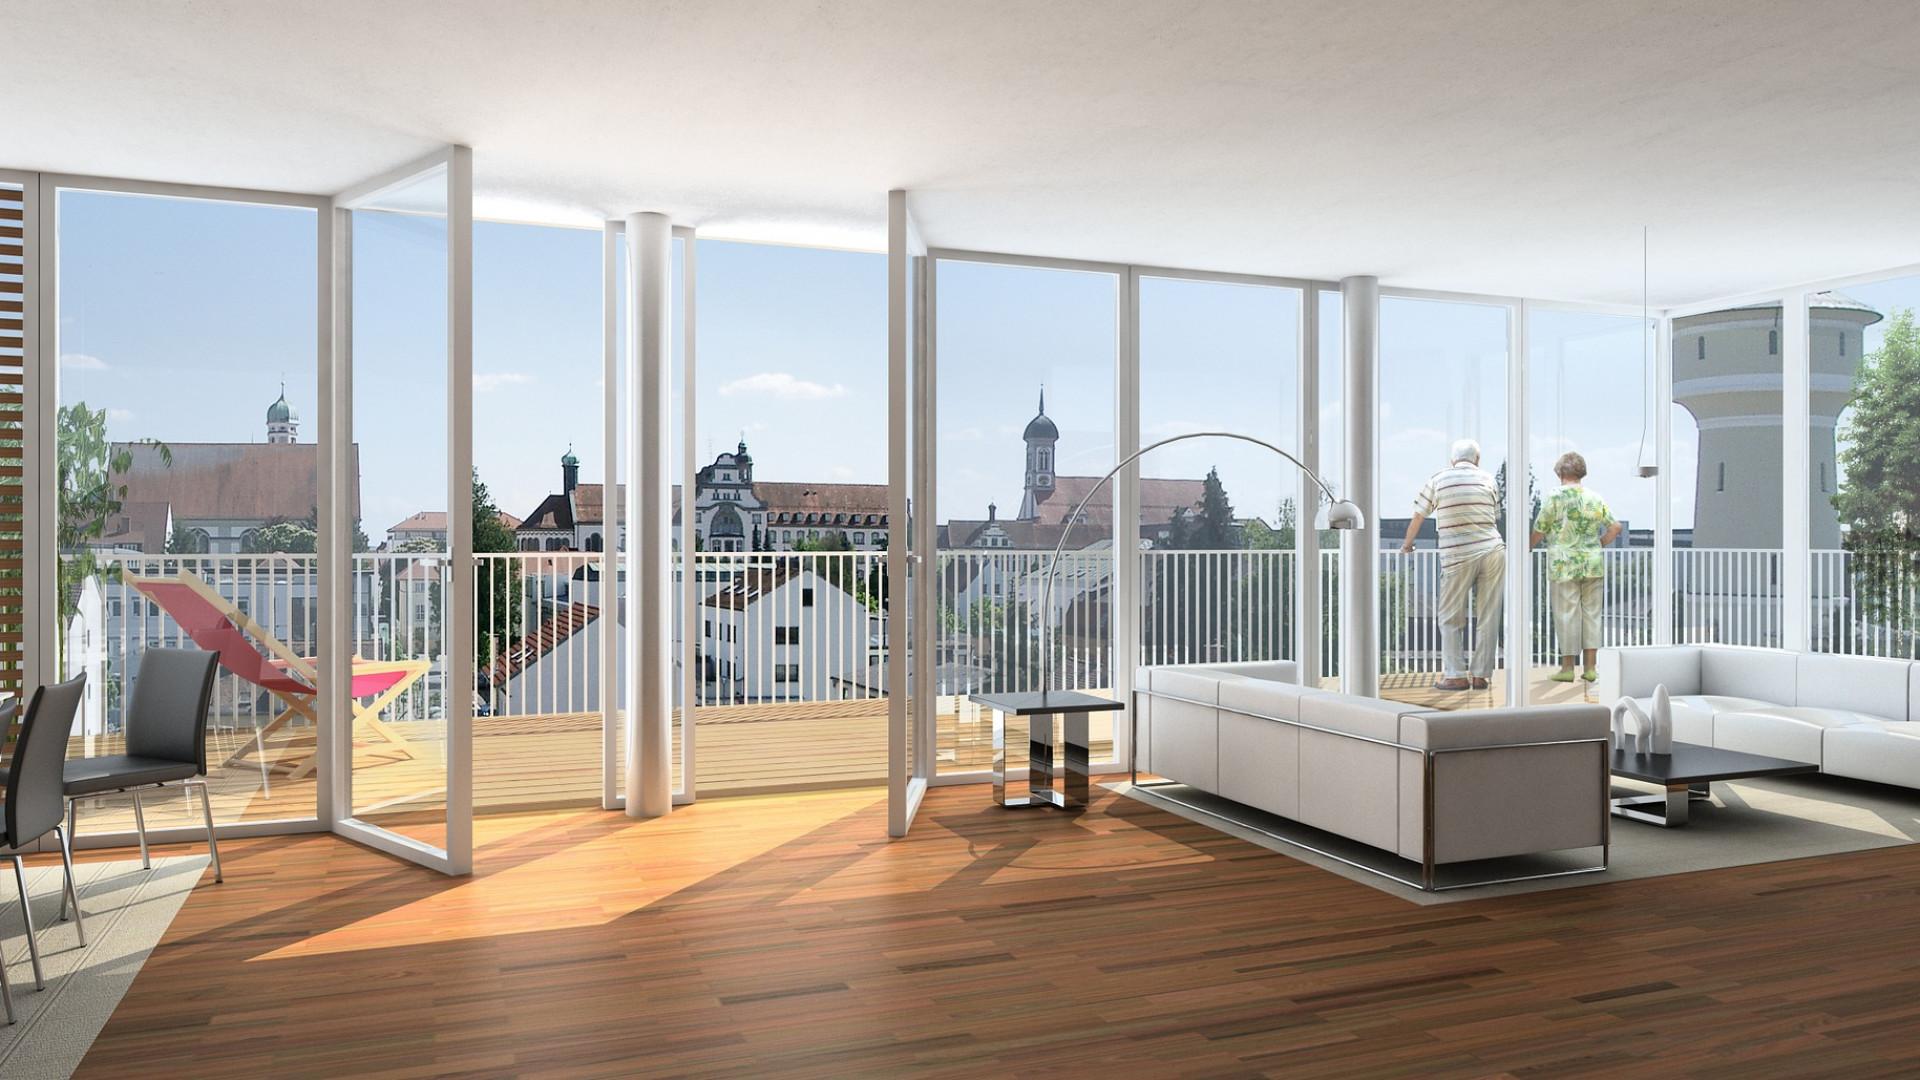 laver efficacement les vitres c 39 est possible obonplan. Black Bedroom Furniture Sets. Home Design Ideas